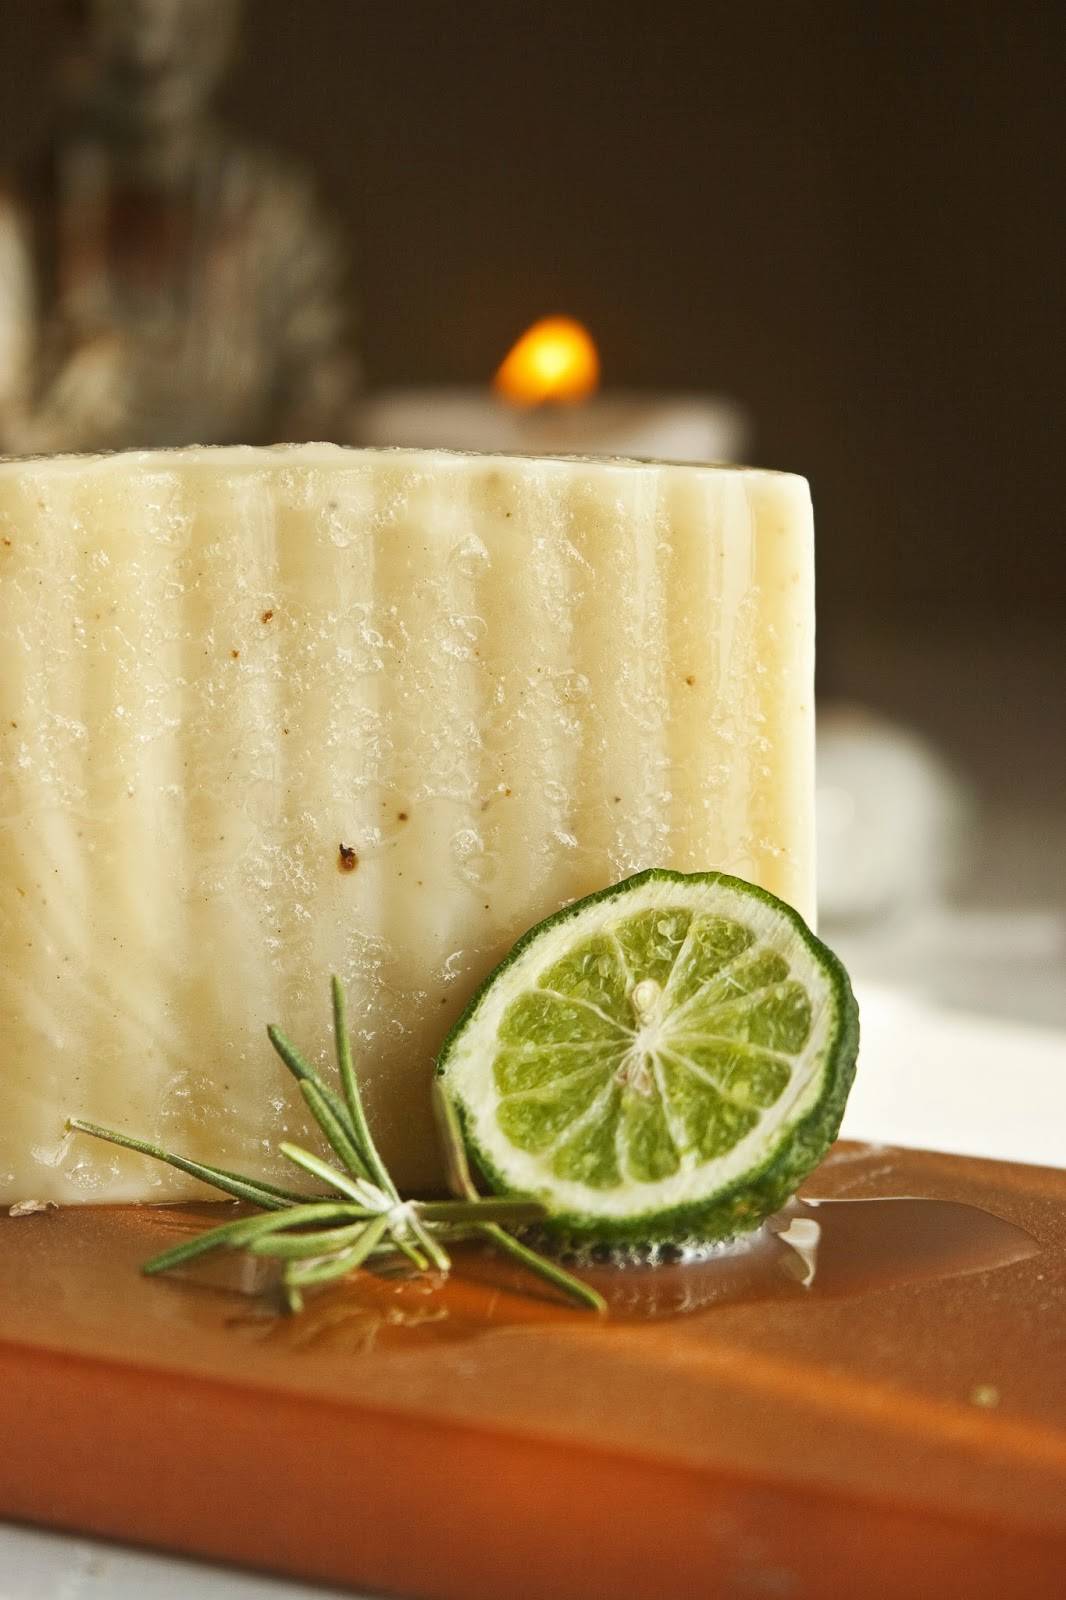 http://www.unearthmalee.com/organic-soap/kaffir-lime-rosemary-soap-bar